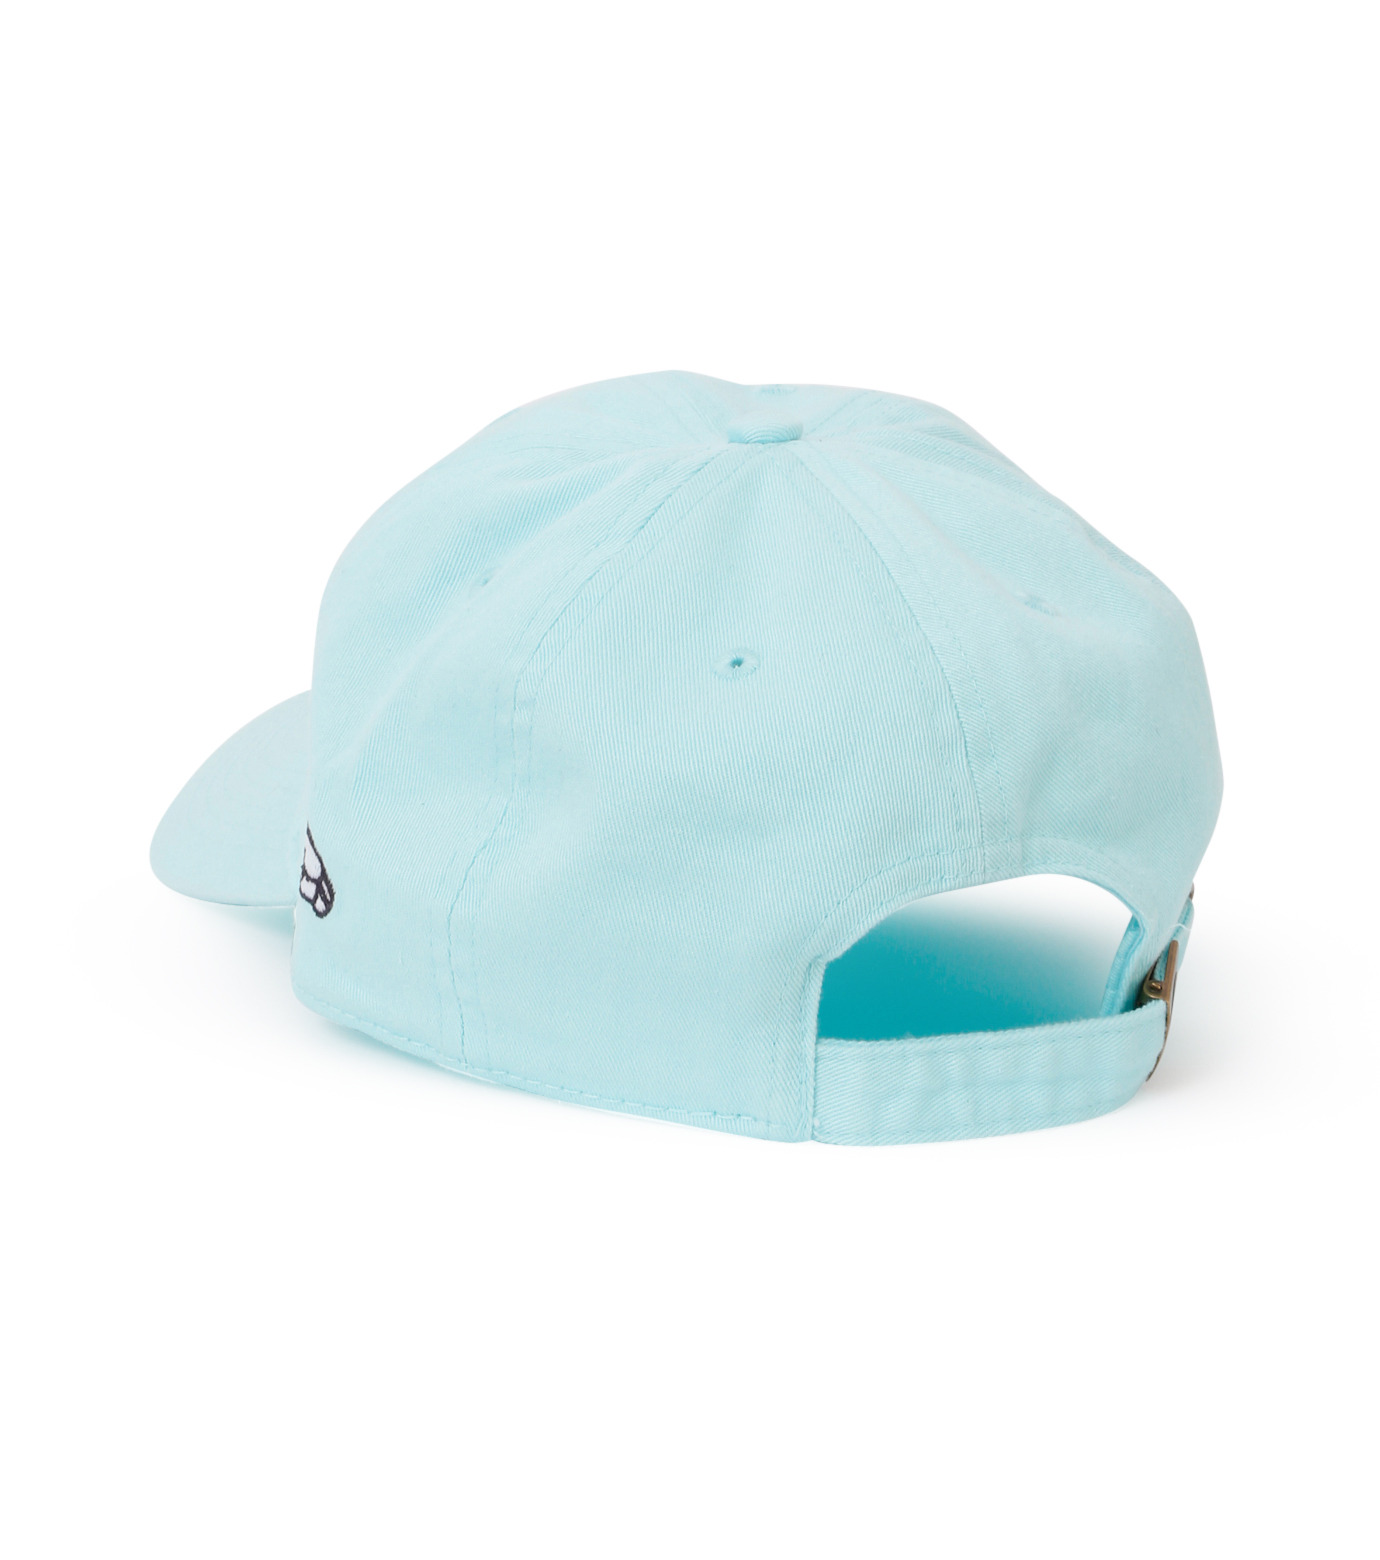 HEY YOU !(ヘイユウ)のHEY! CAP-LIGHT BLUE(キャップ/cap)-18S90020-91 拡大詳細画像3